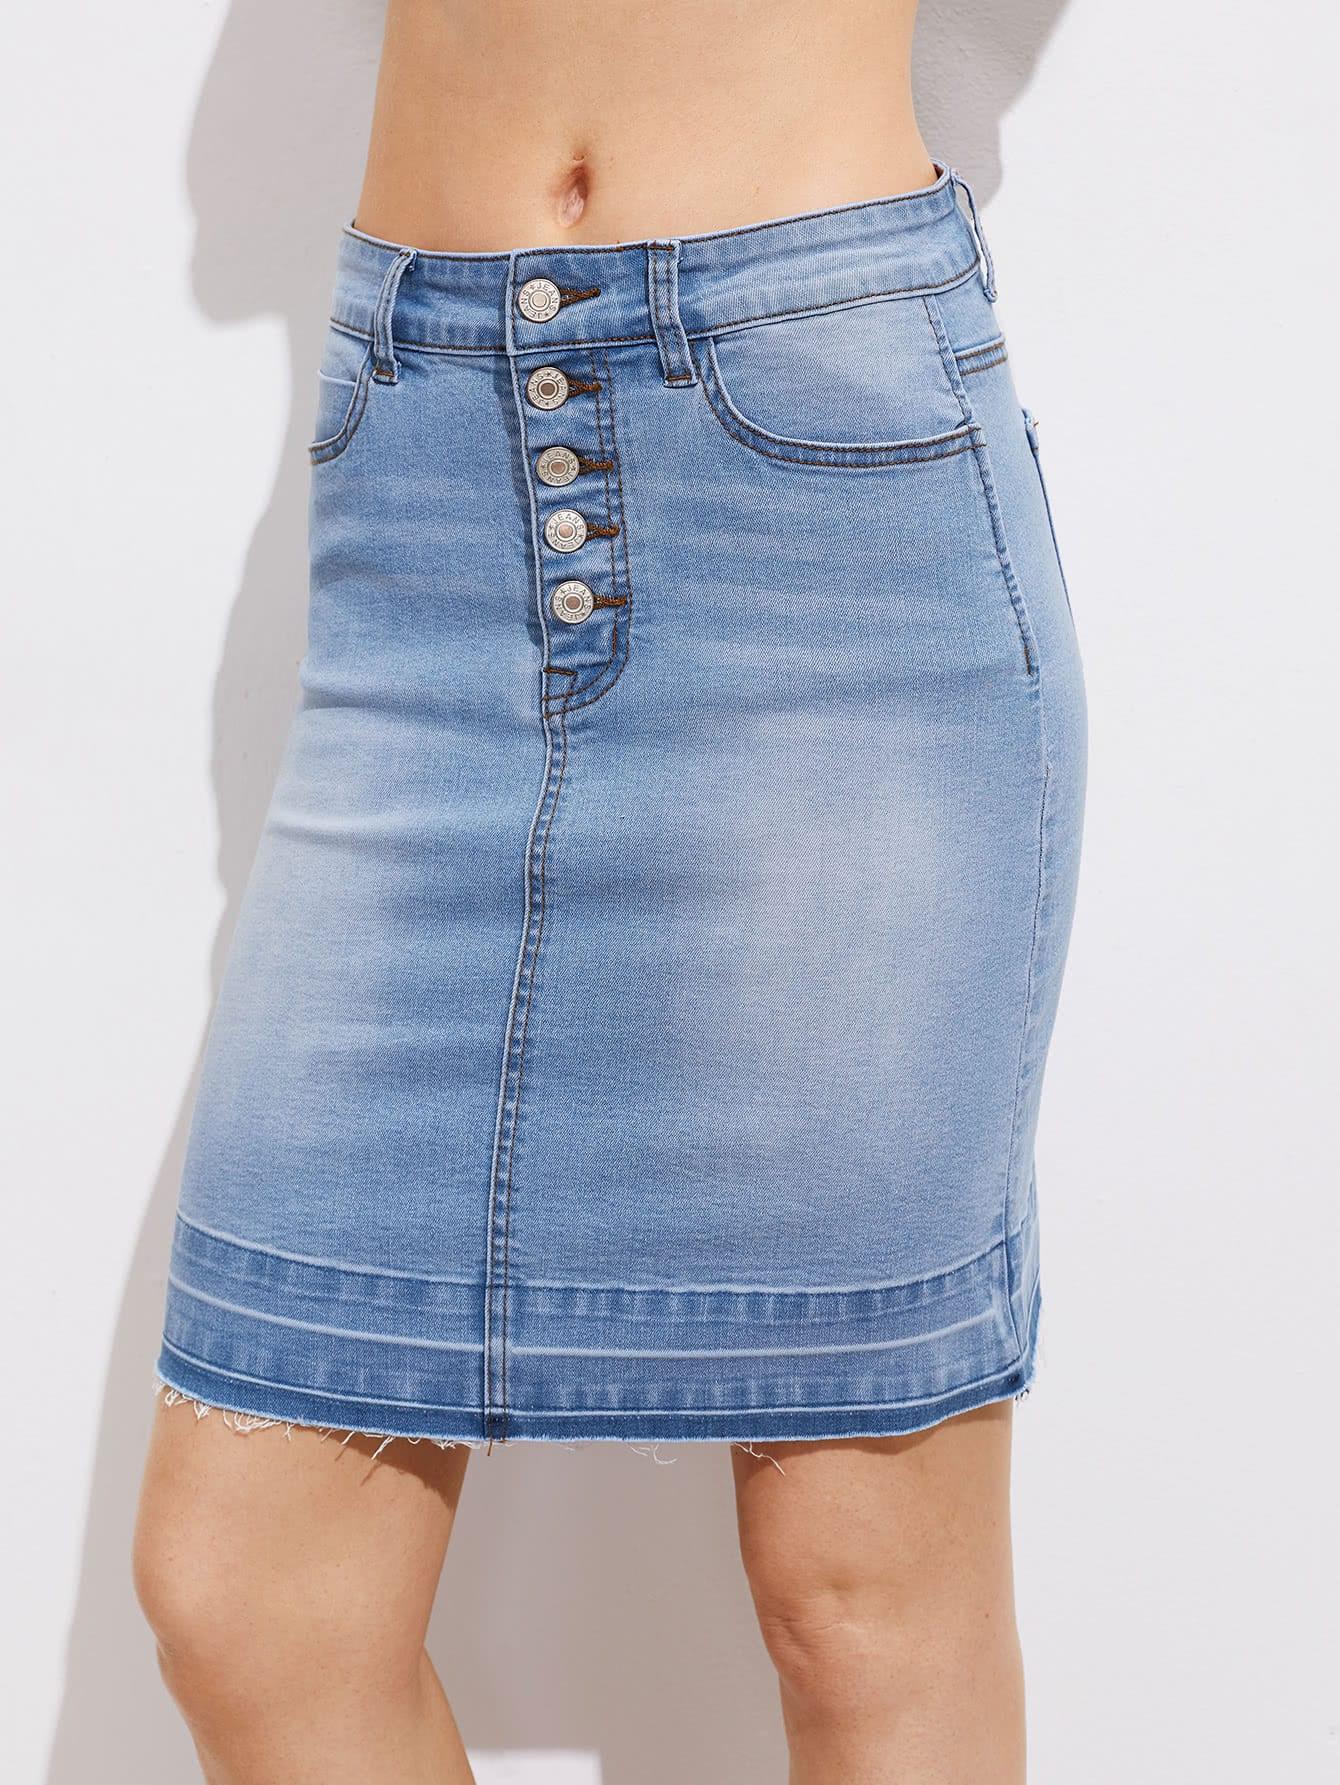 Фото Buttoned Fly Vented Back Bleach Wash Denim Skirt. Купить с доставкой